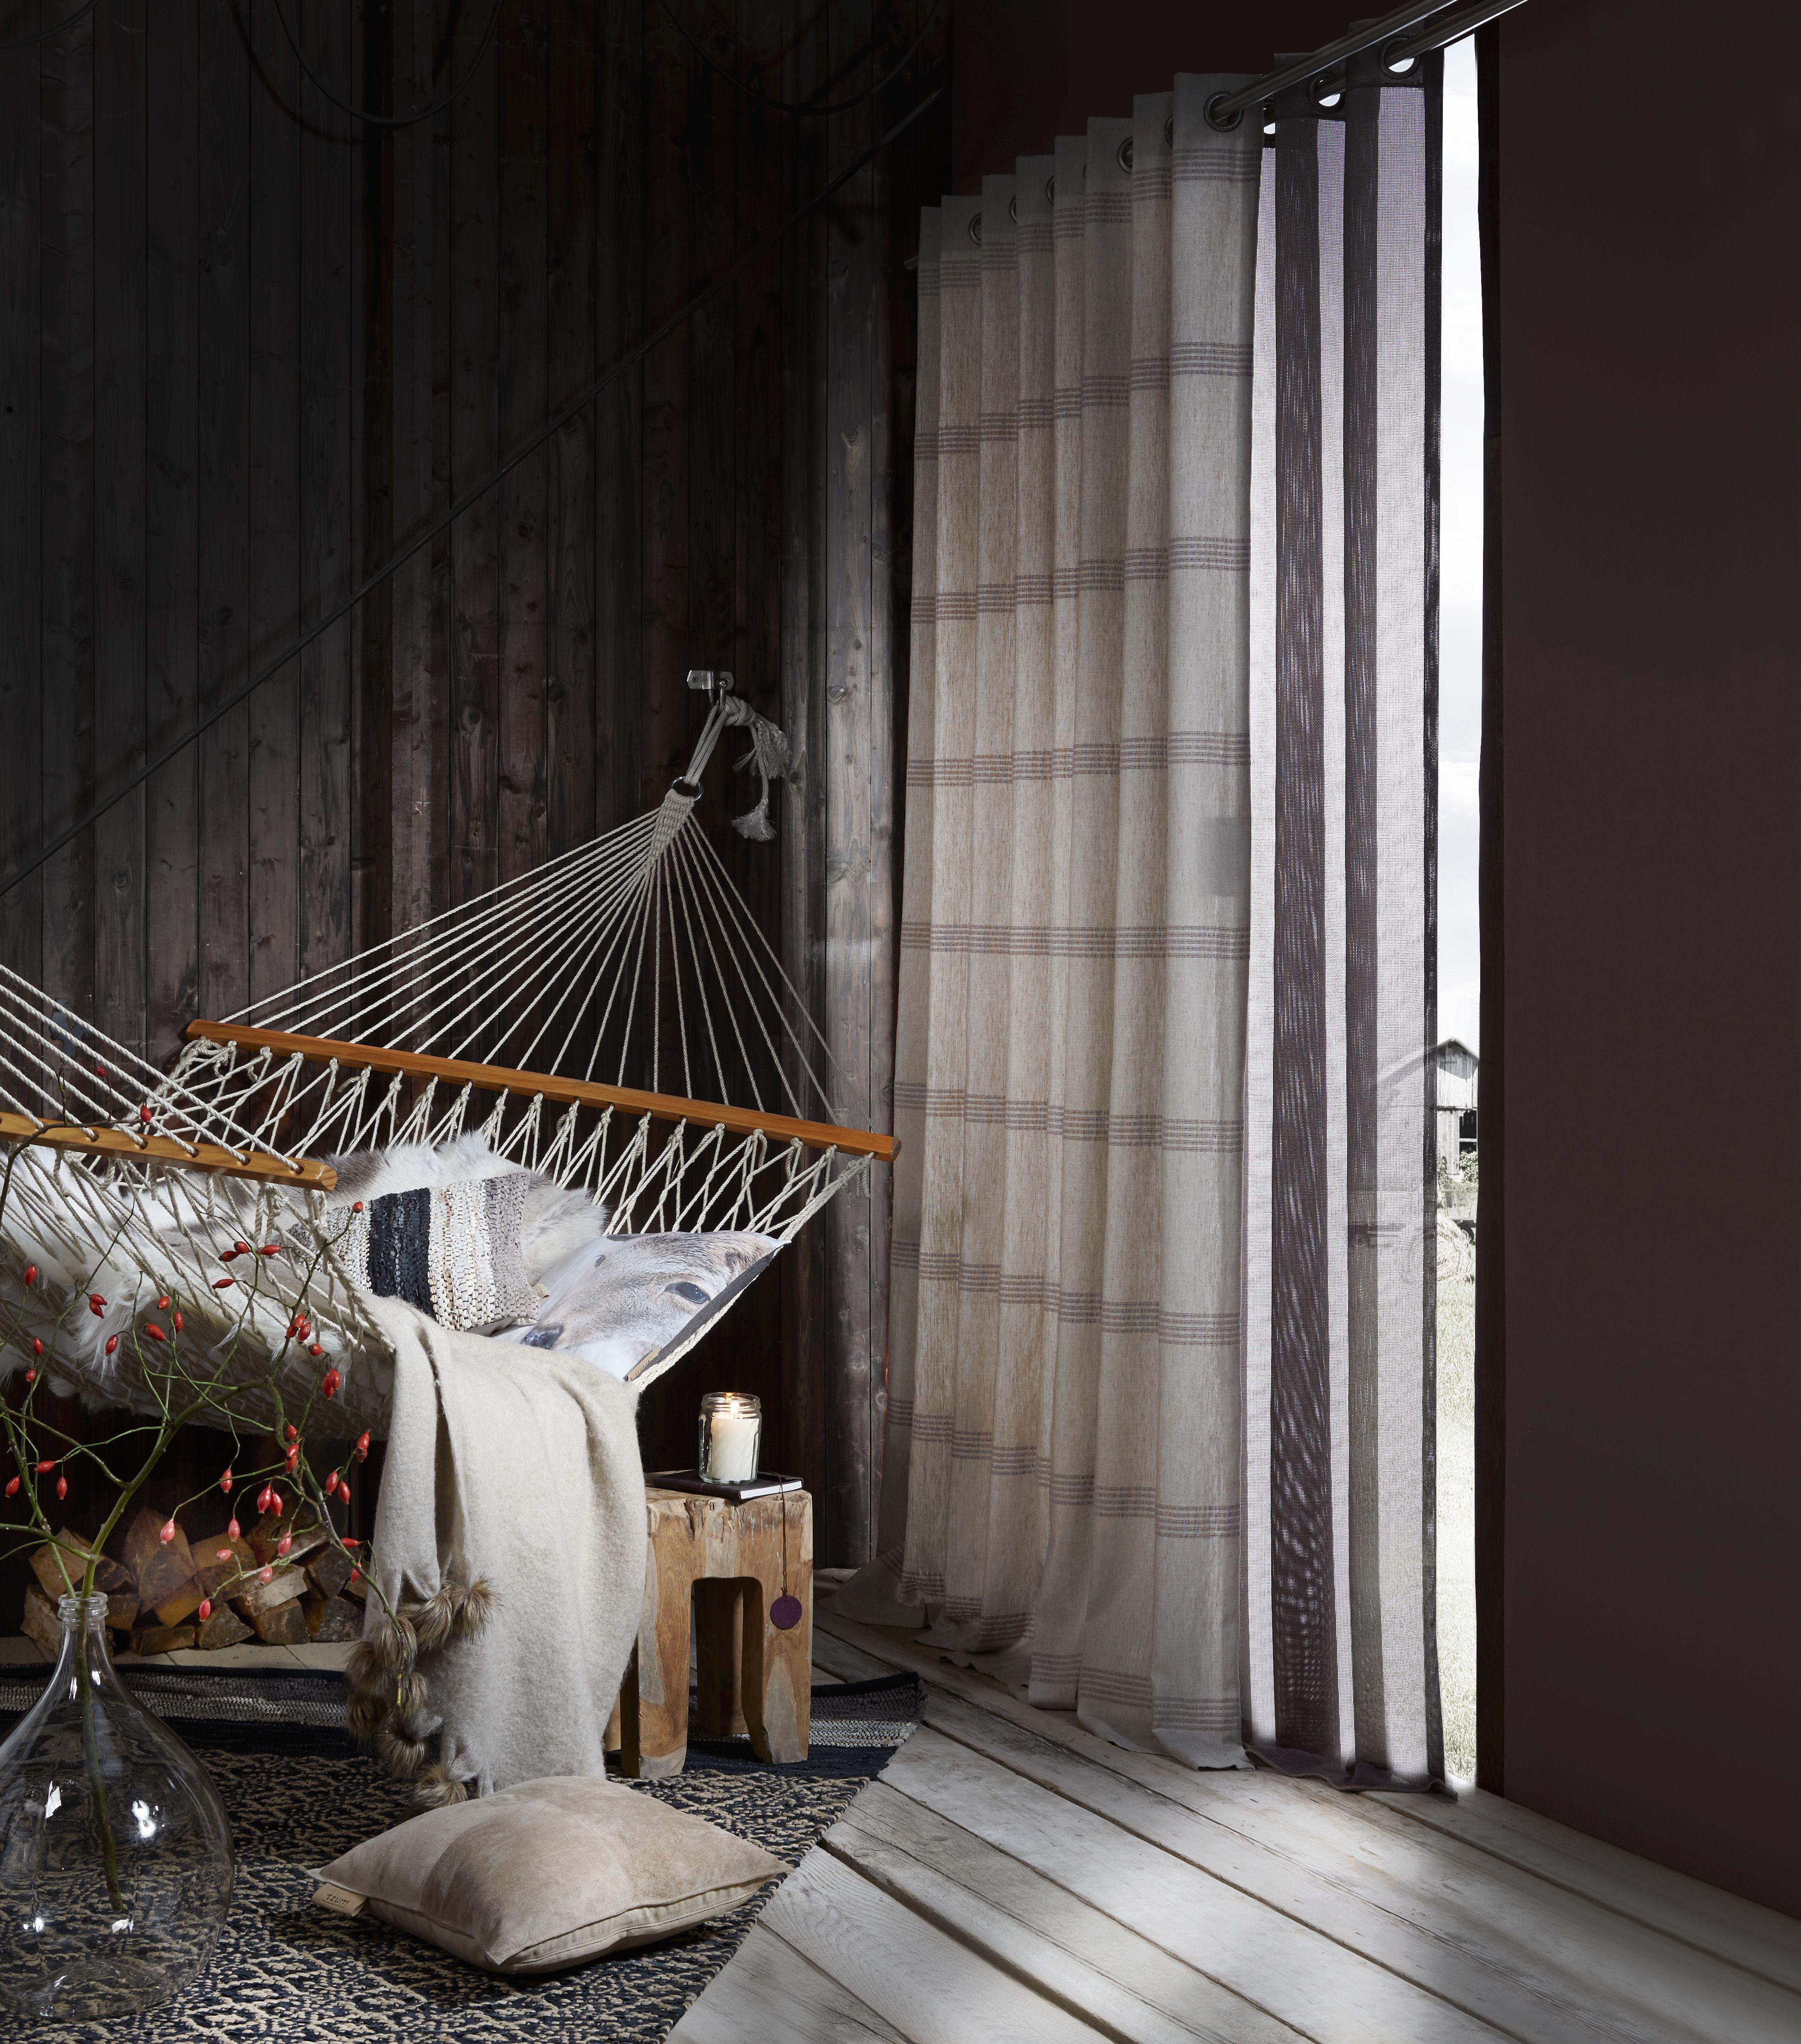 Original #curtains for an easy lifestyle. Puur, stijlvol en ...